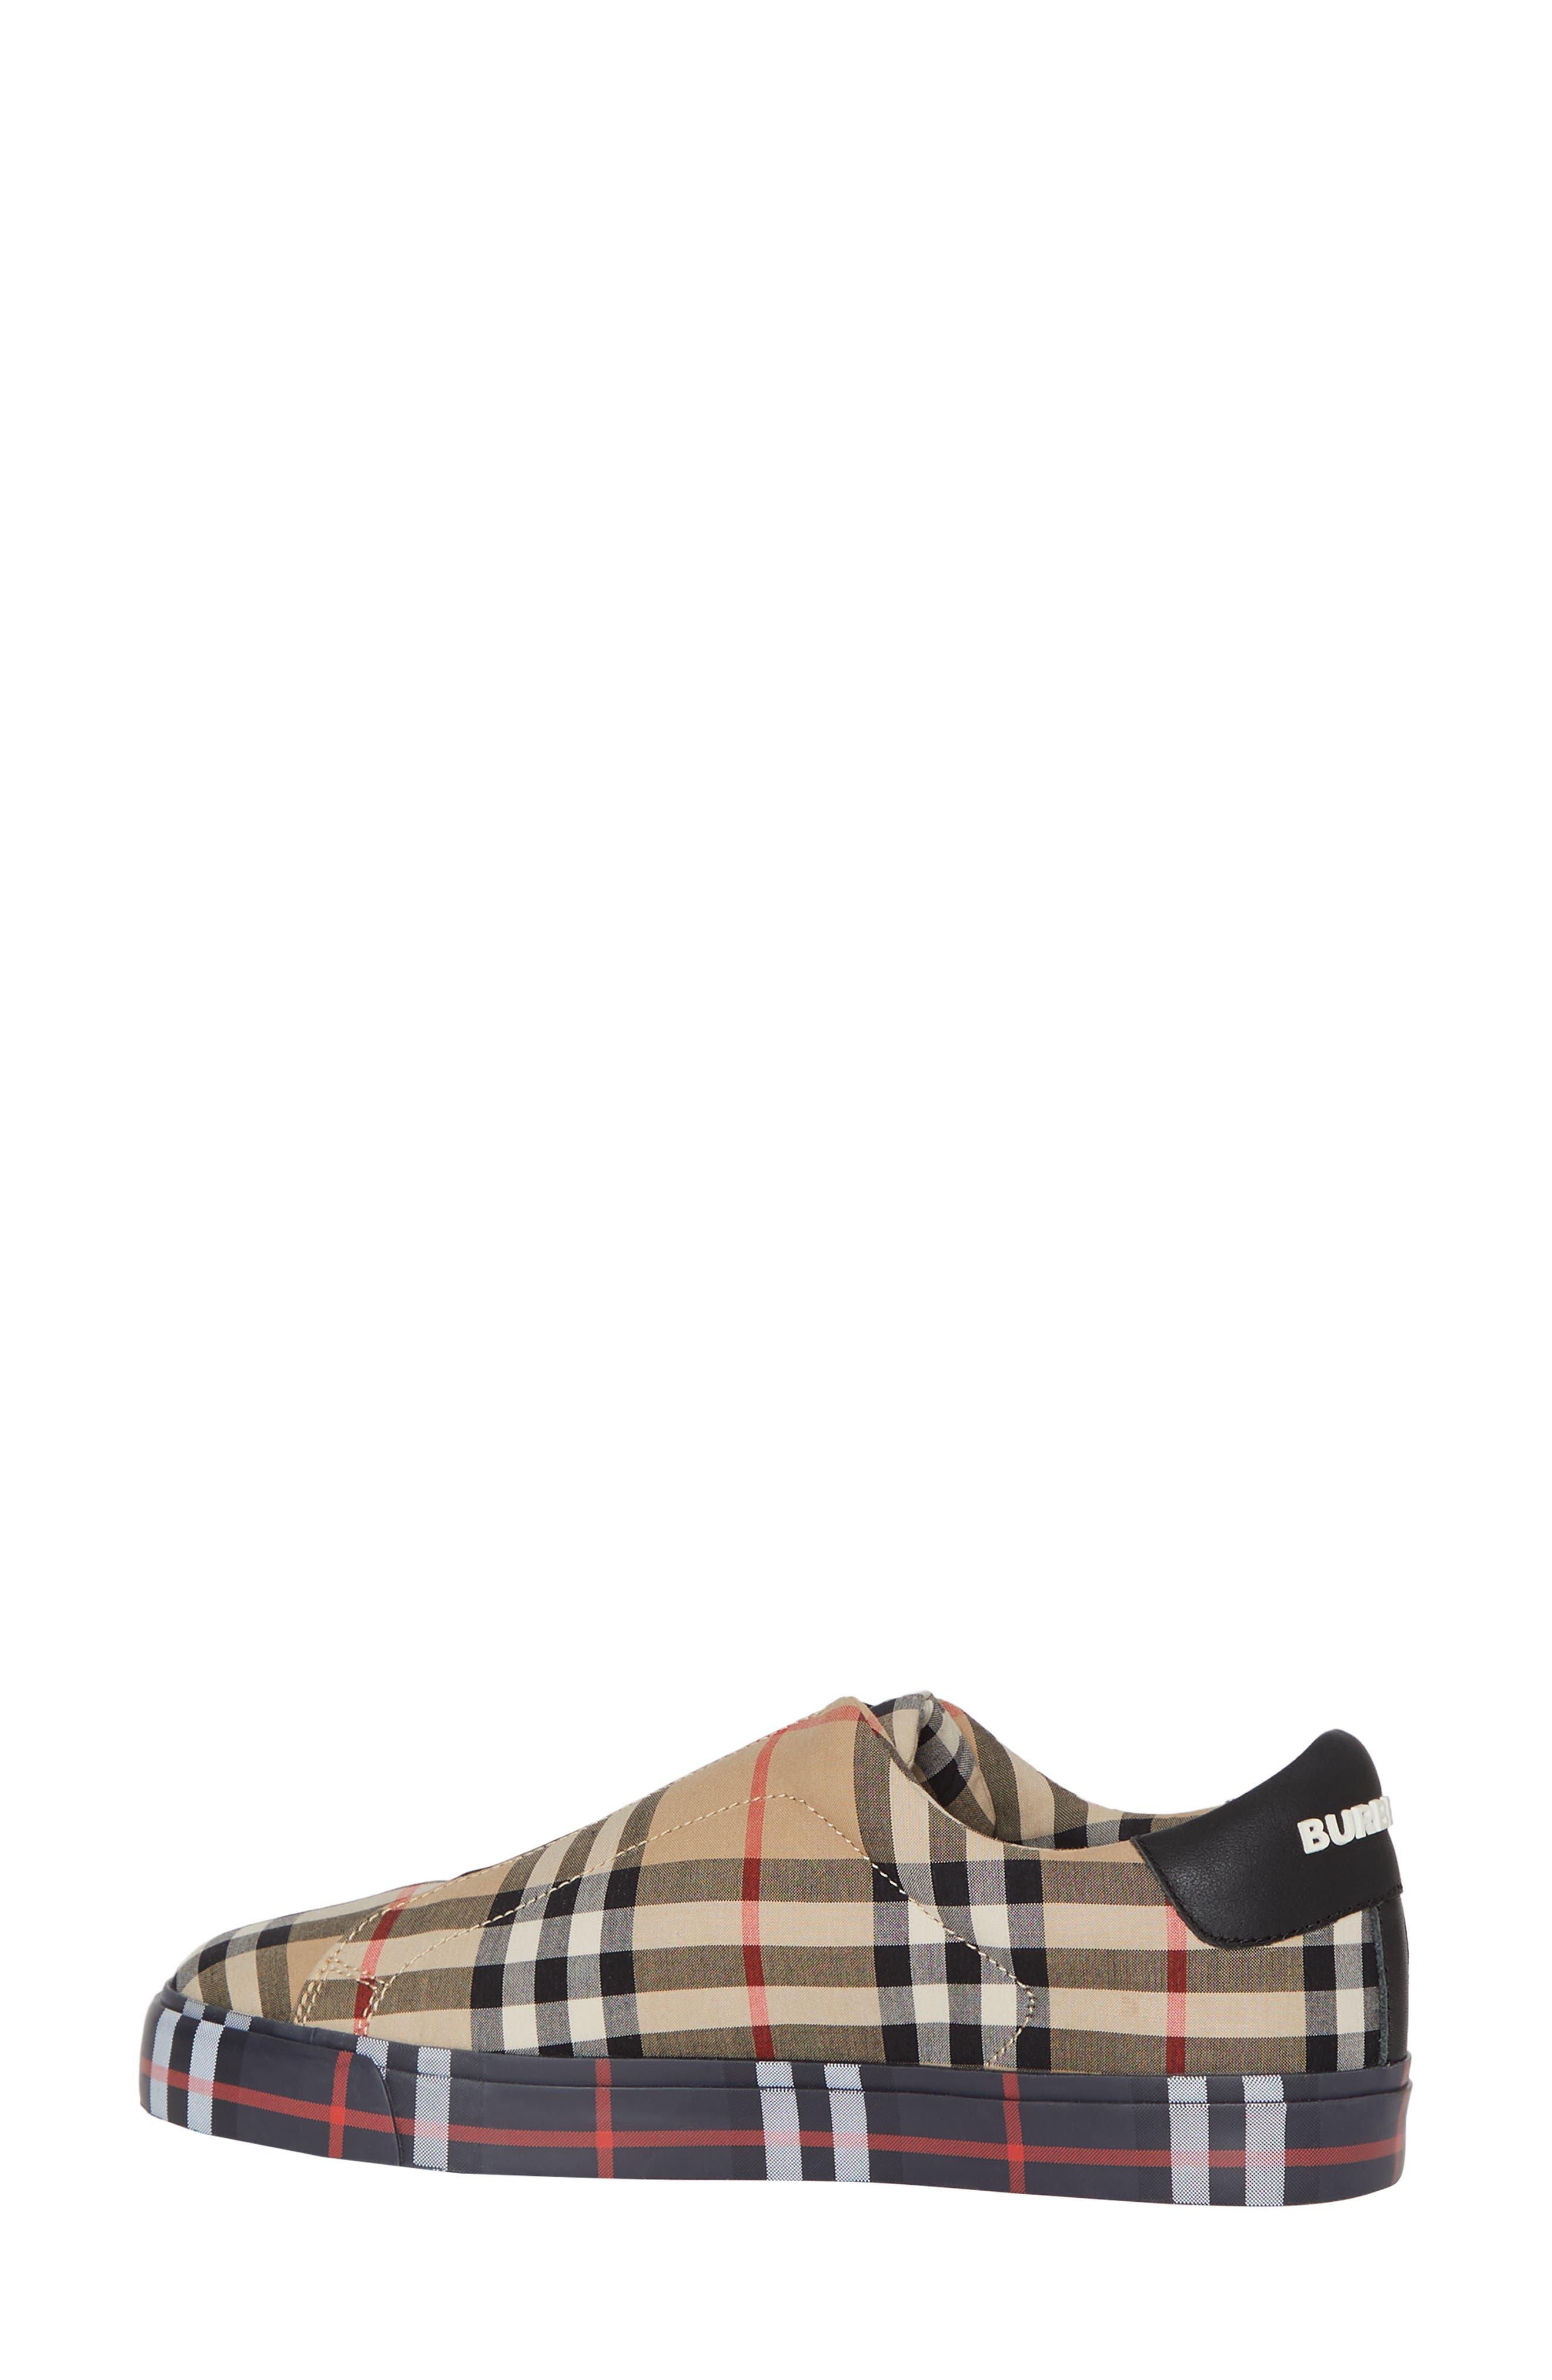 BURBERRY, Markham Vintage Check Slip-On Sneaker, Alternate thumbnail 2, color, BEIGE PLAID